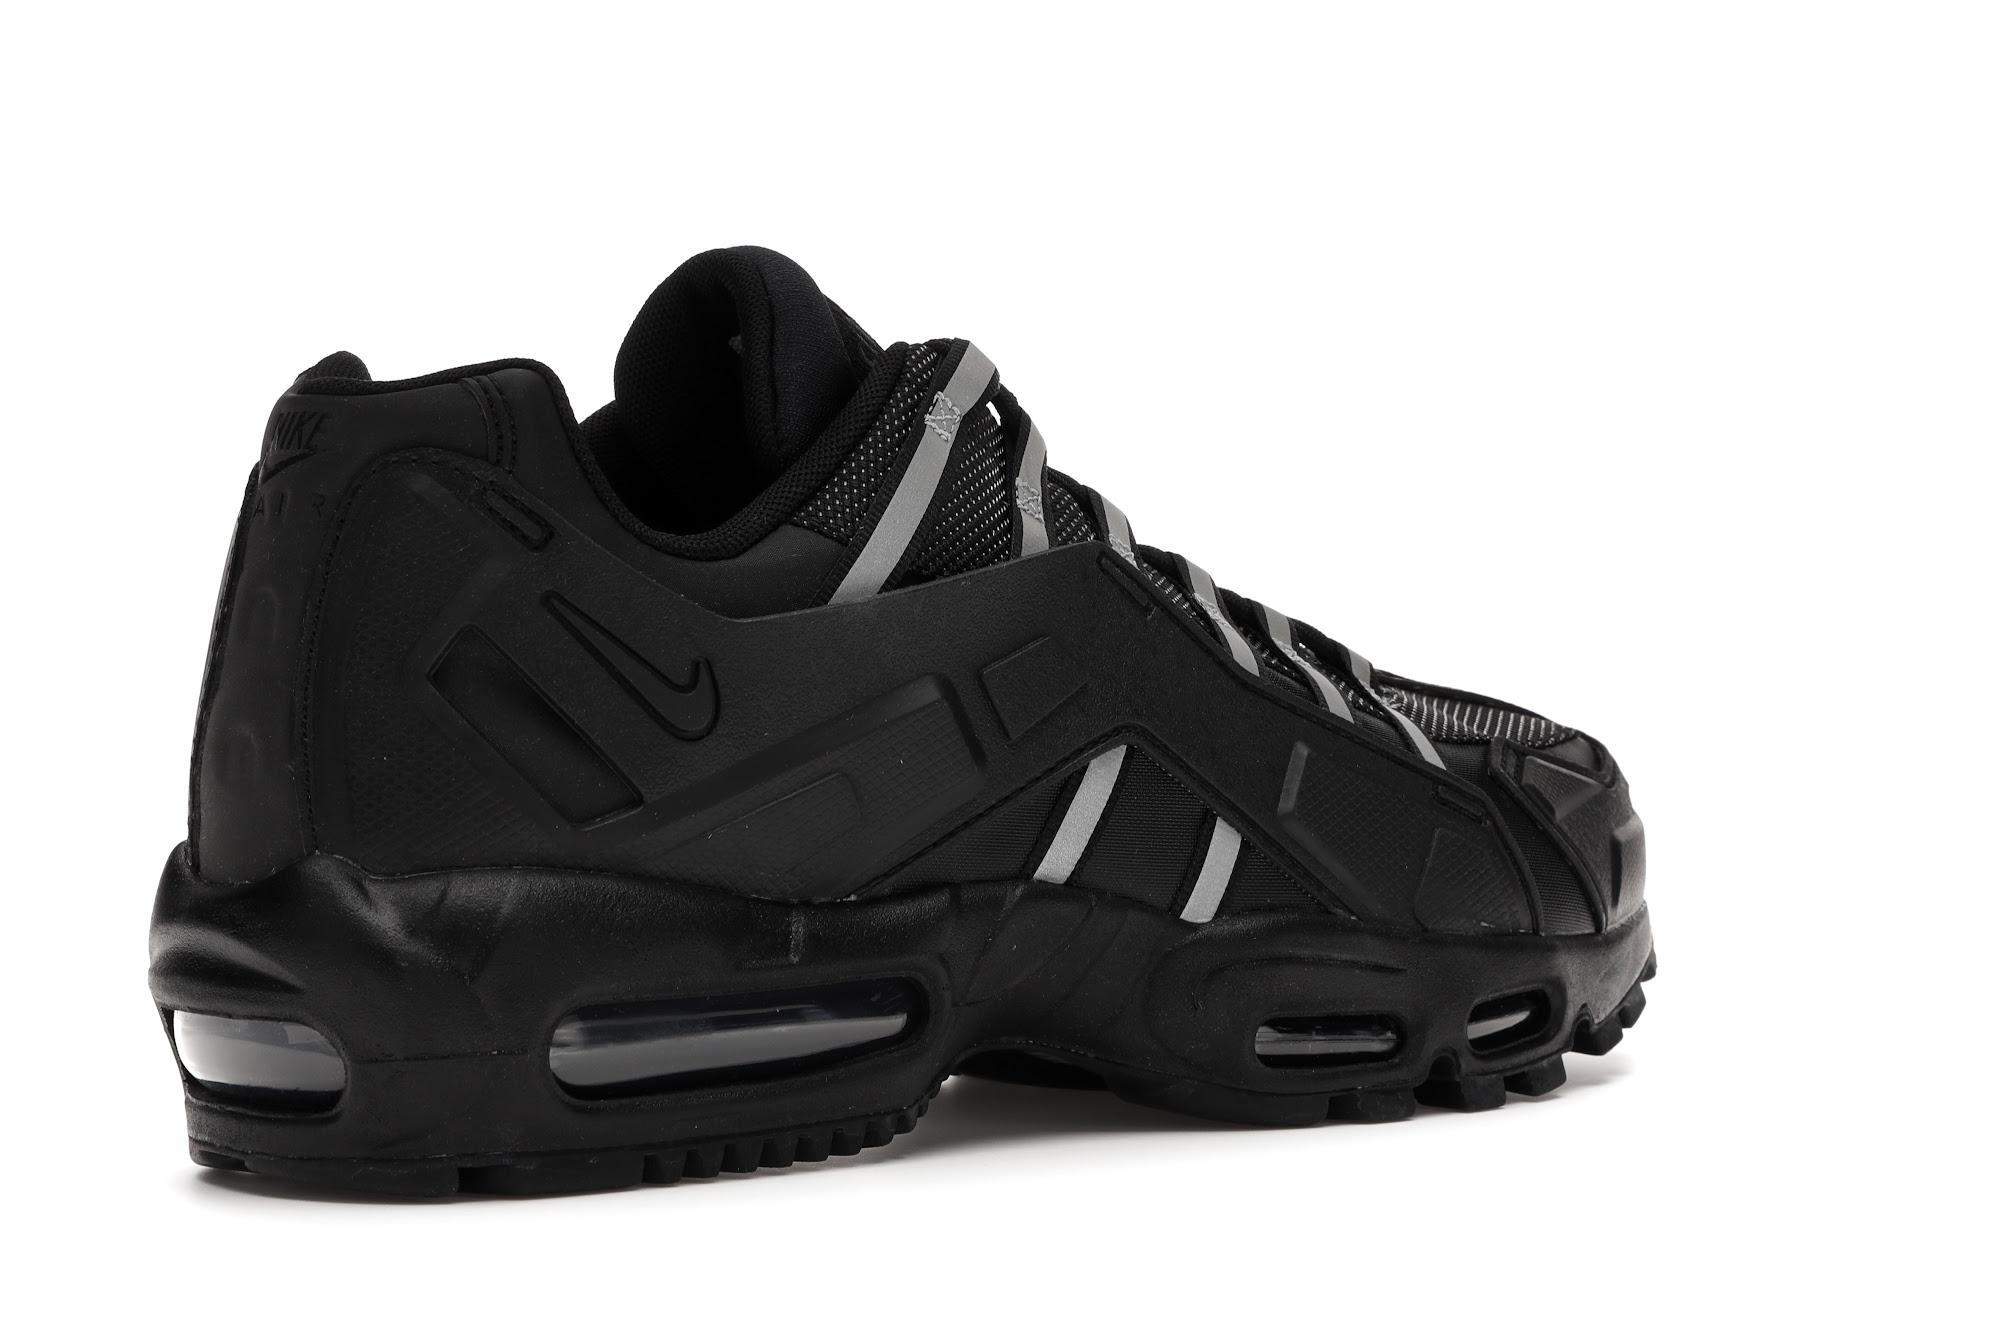 Nike Air Max 95 NDSTRKT Black Reflective - CZ3591-001